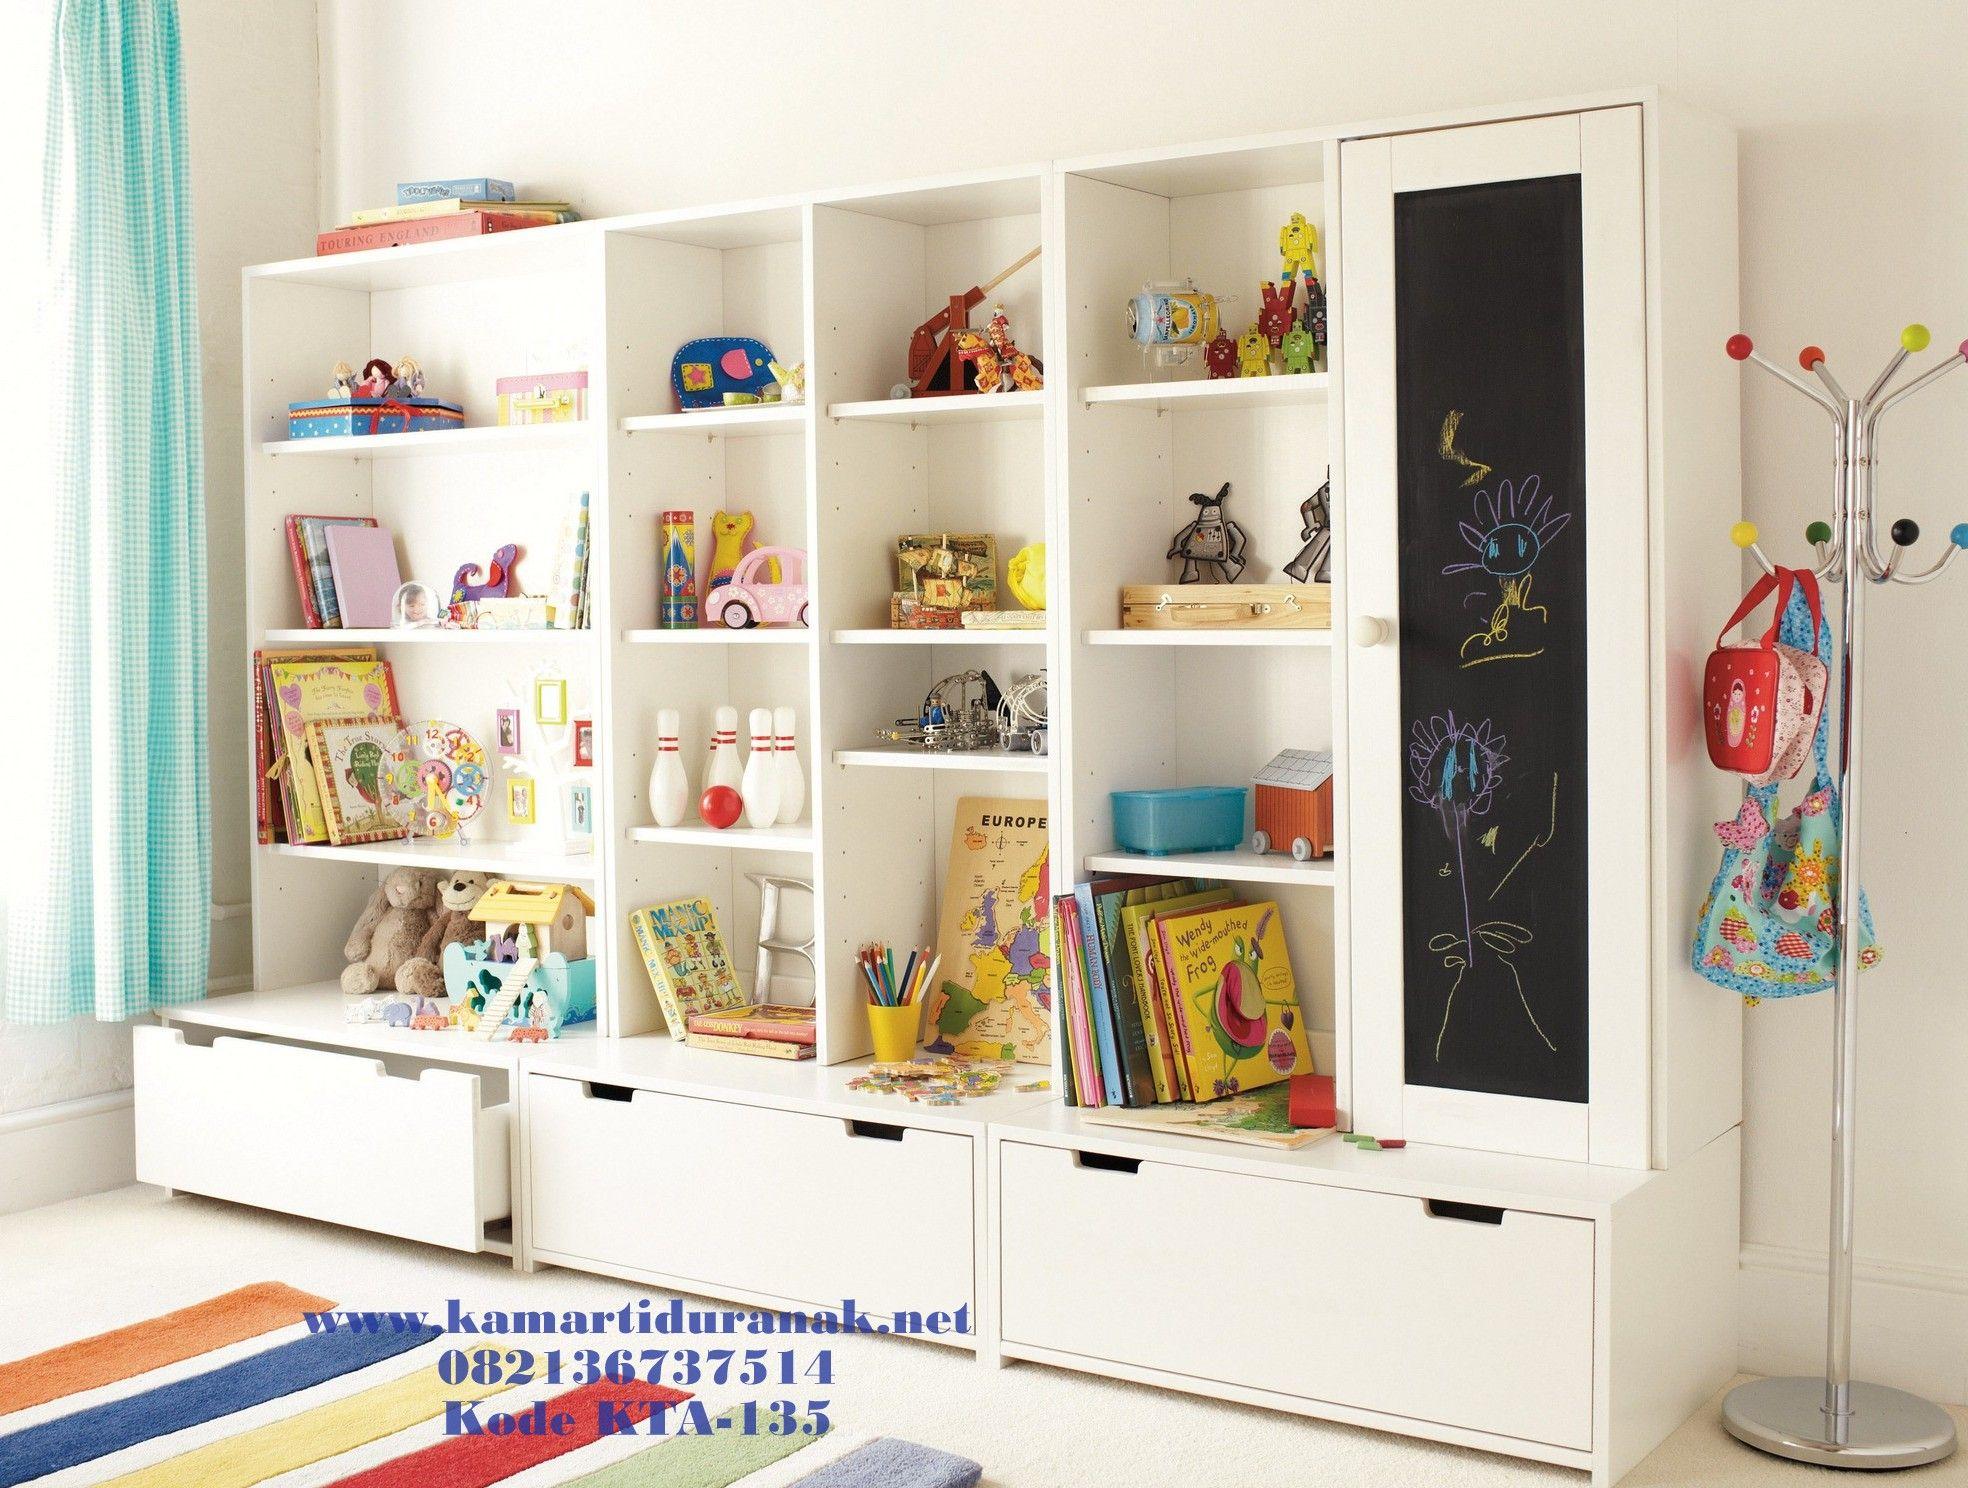 Desain Rak Lemari Boneka Anak Modern Minimalis Duco Diana Terbaru